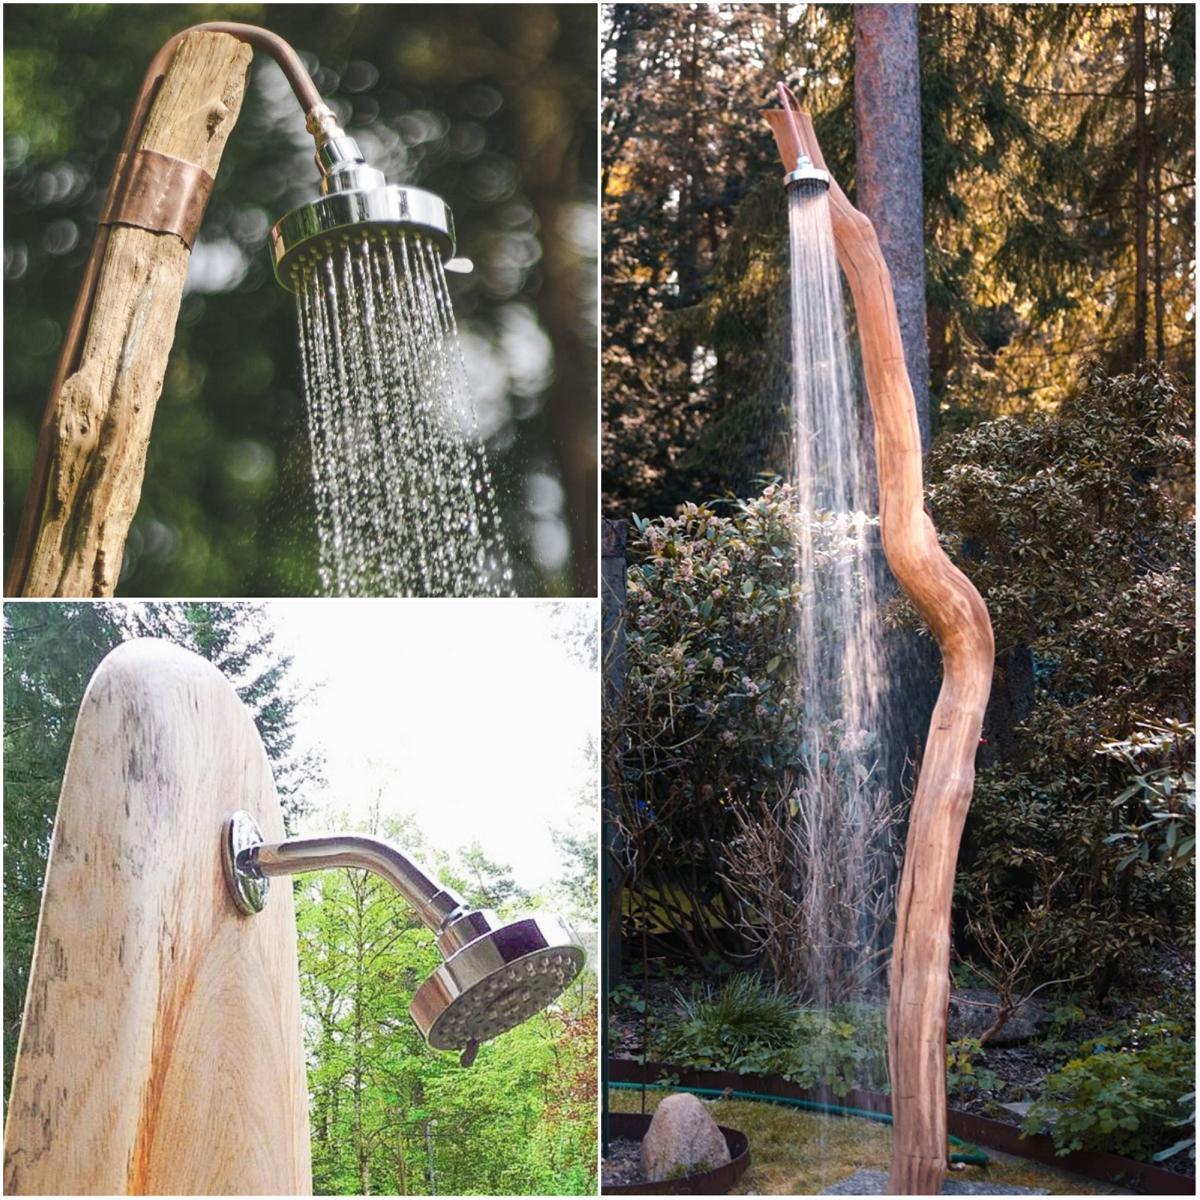 style hannover marc müller objekte 13 - Outdoorduschen by Marcodifranco art design